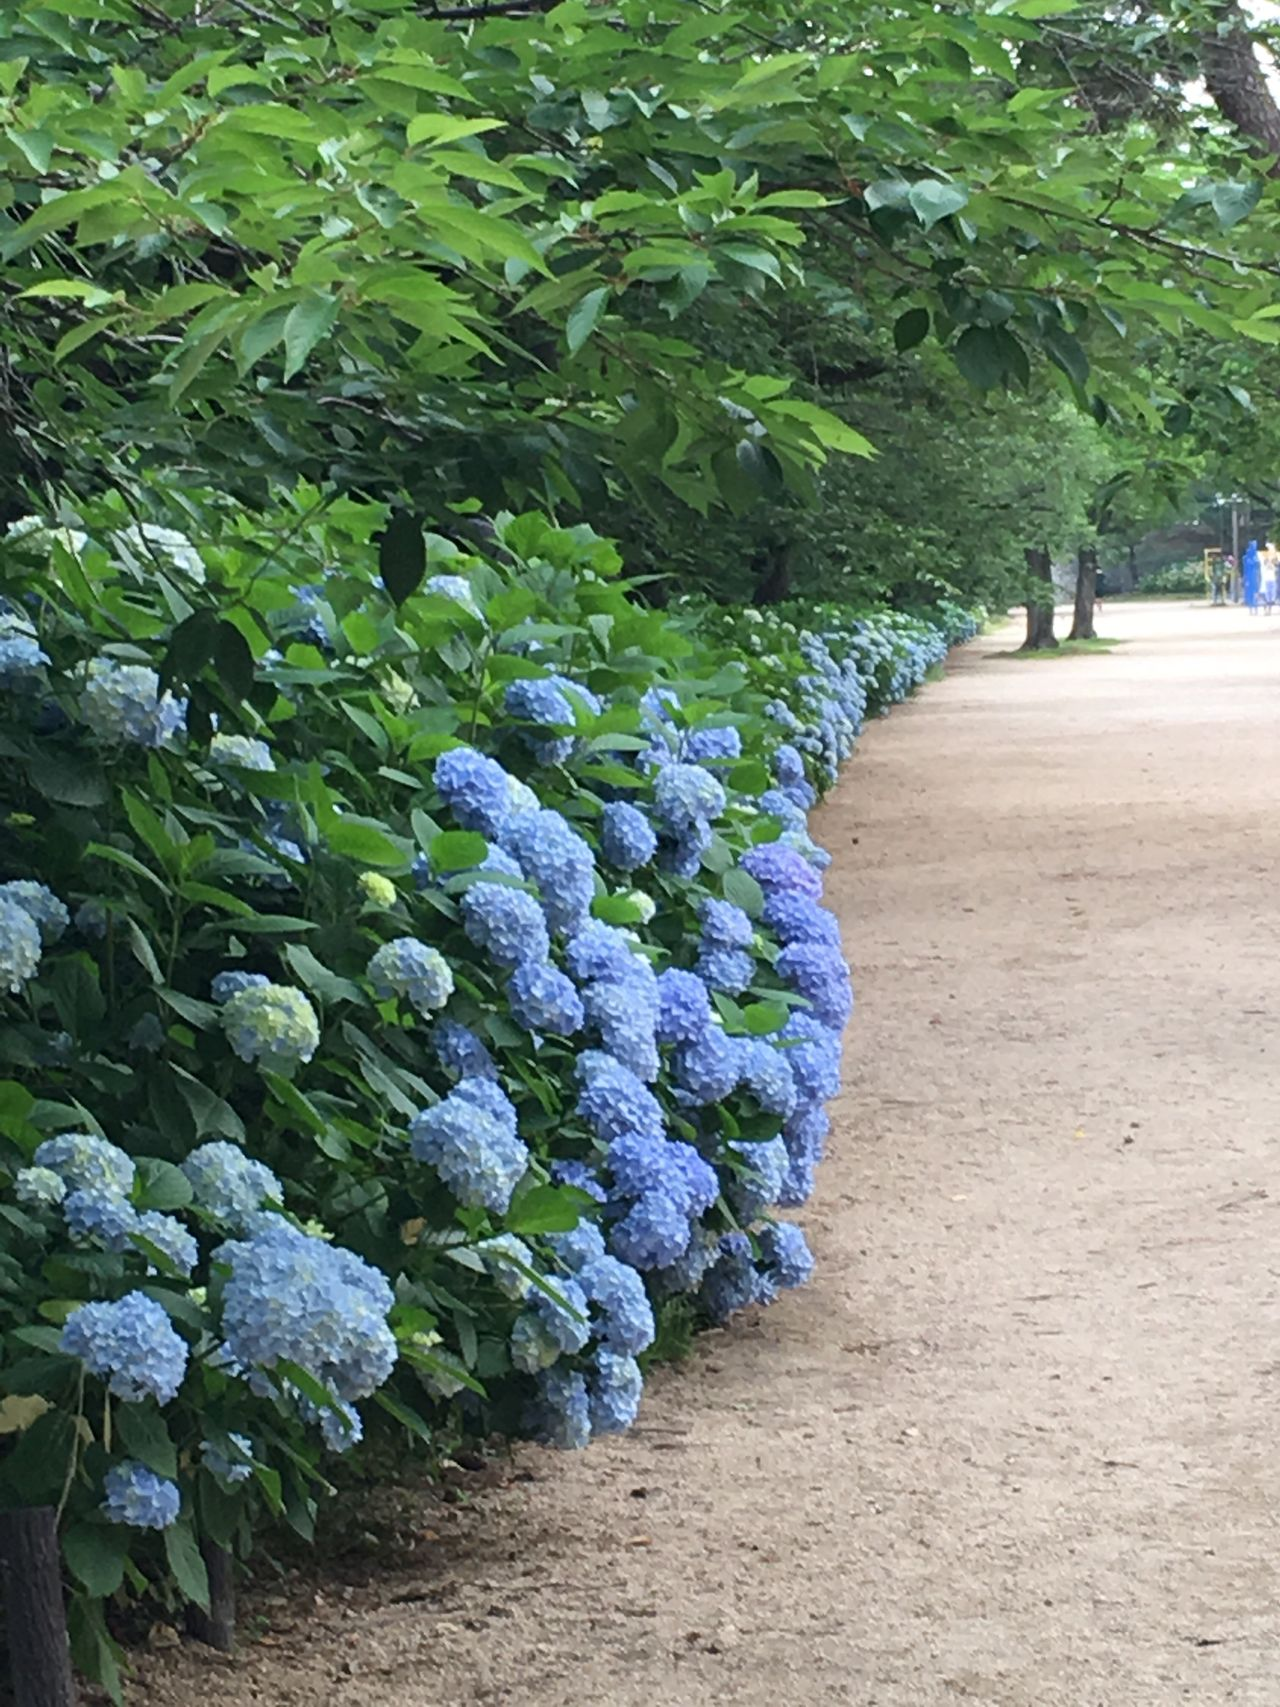 Hydrangea Blue Blue Flowers Park 夙川 Rainy Season Green Japan